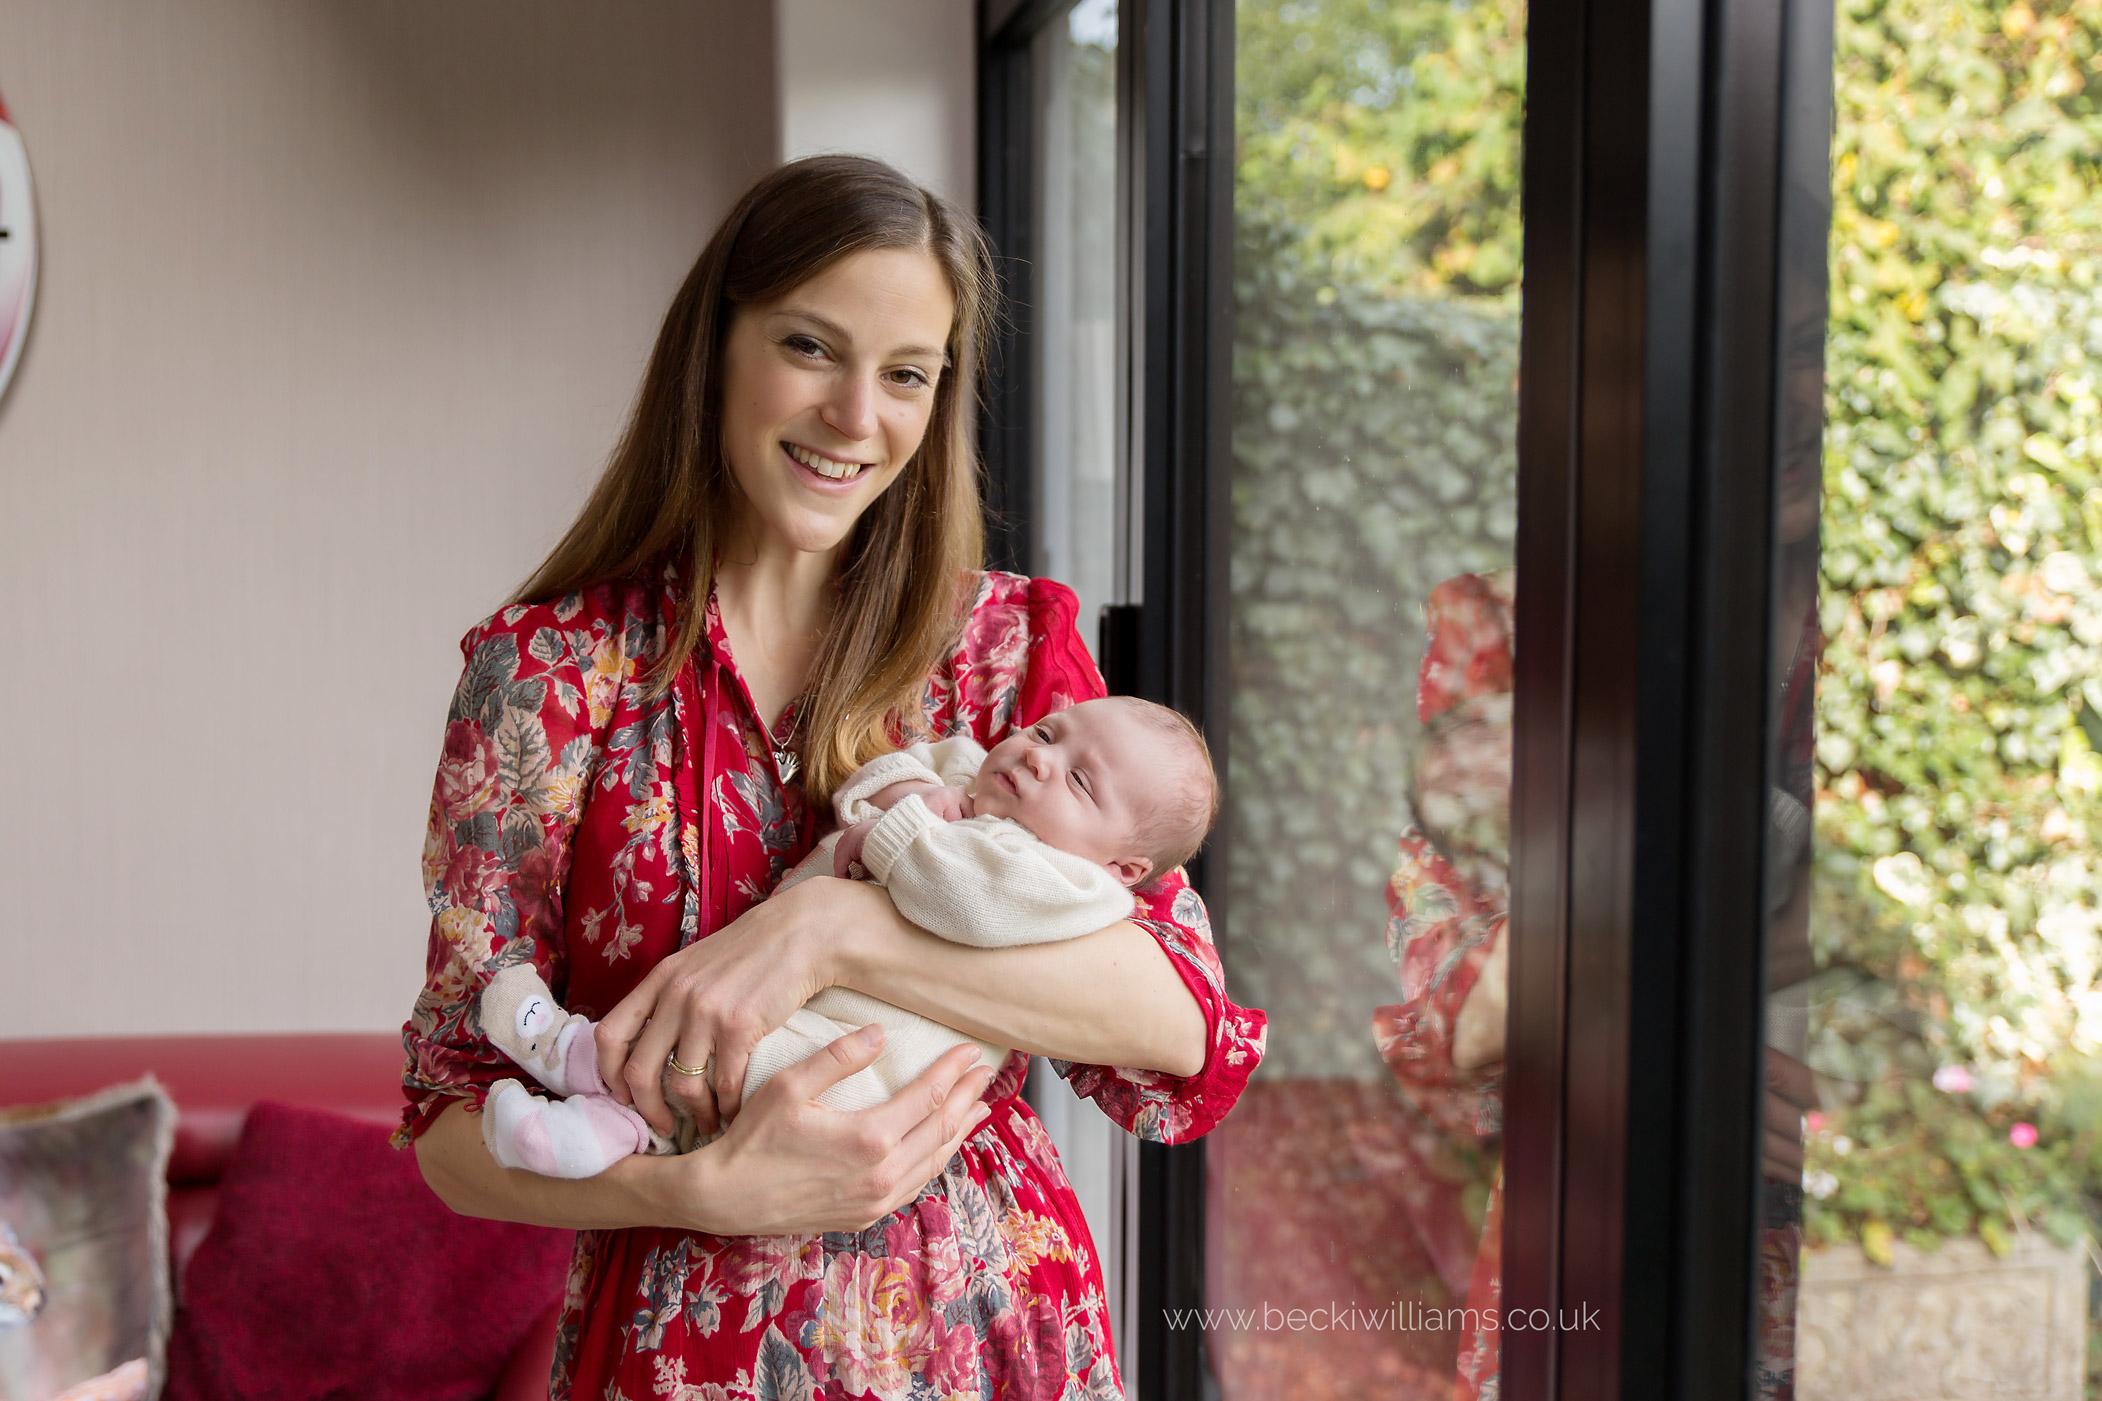 lifestyle-newborn-photography-hemel-hempstead-redbourn-at-home-new-mum-relaxed-becki-williams-photography.jpg